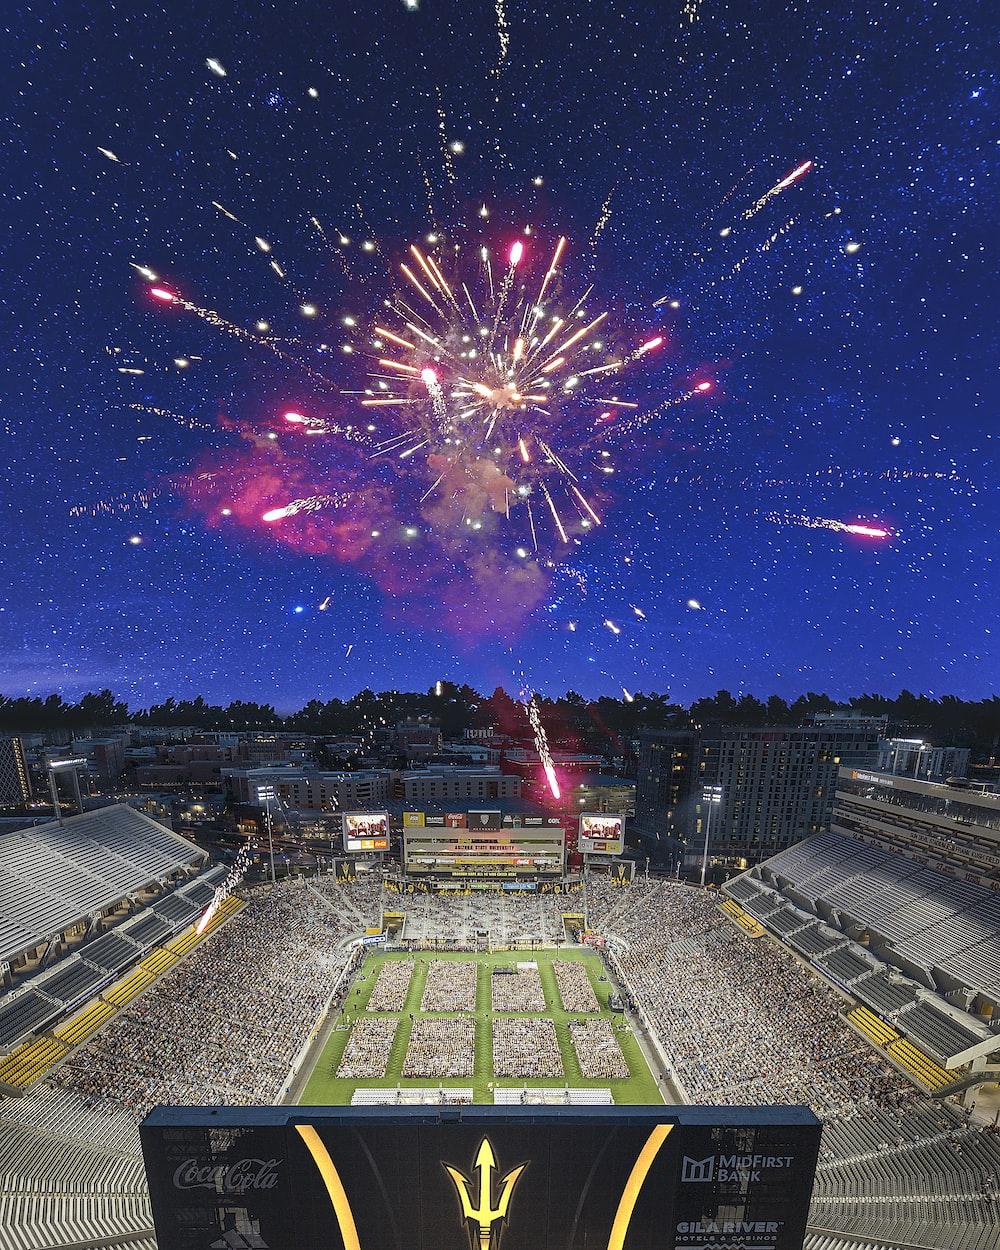 aerial view of people in stadium watching fireworks